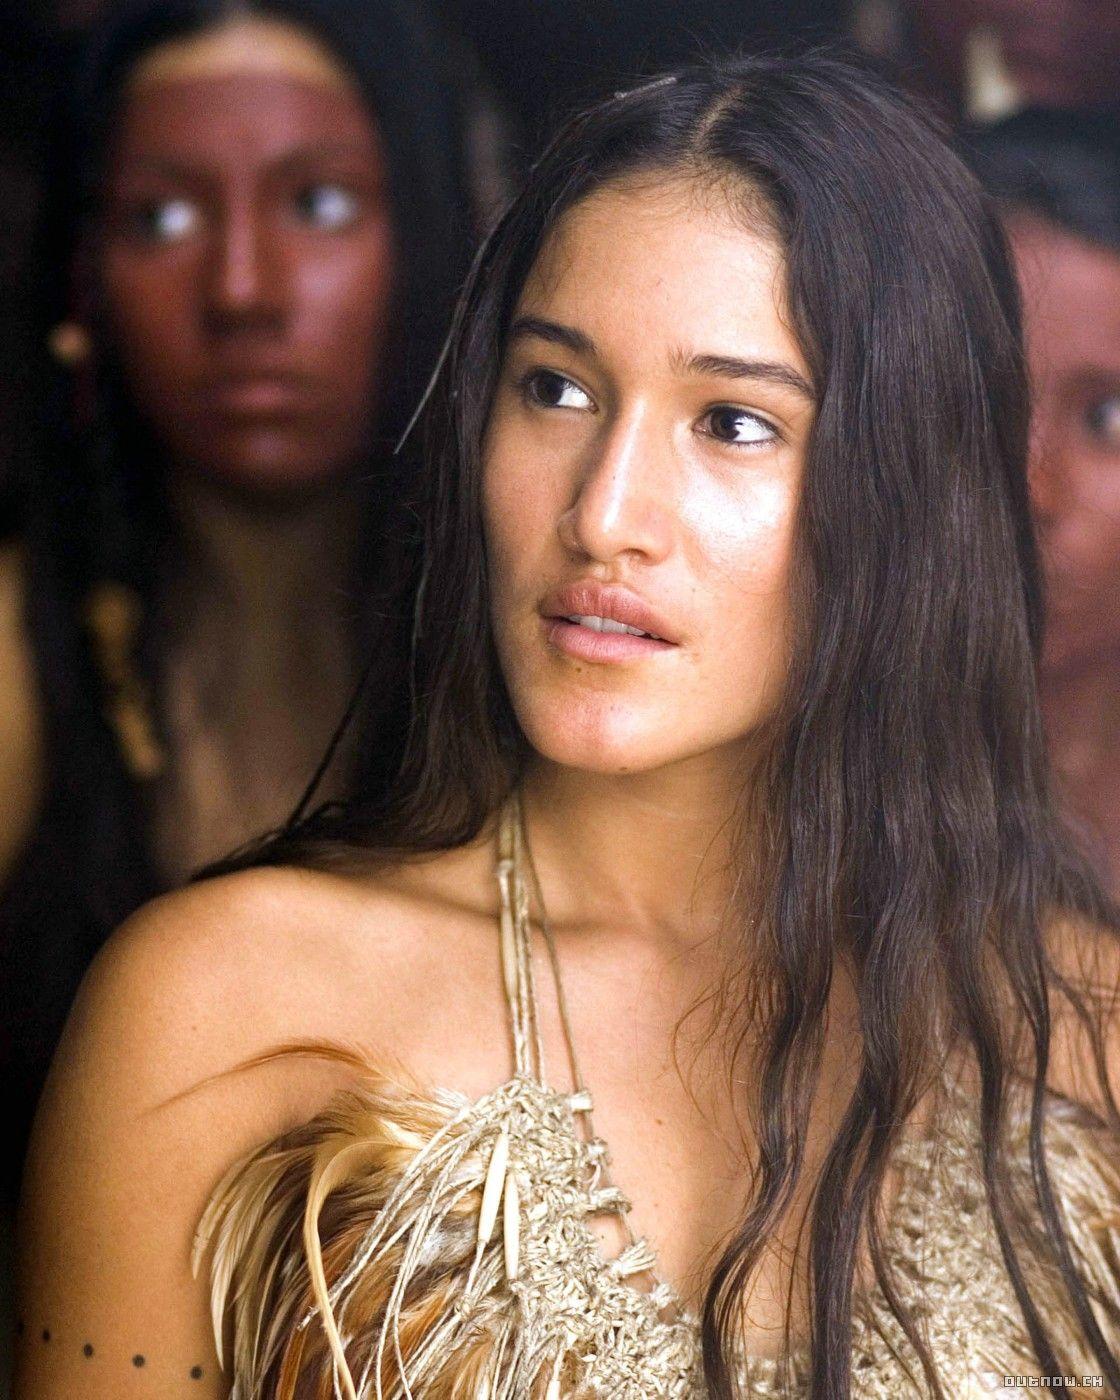 Dangermousie Dangermousie S Most Anticipated Movie Left The New World Native American Women Native American Girls Native American Beauty